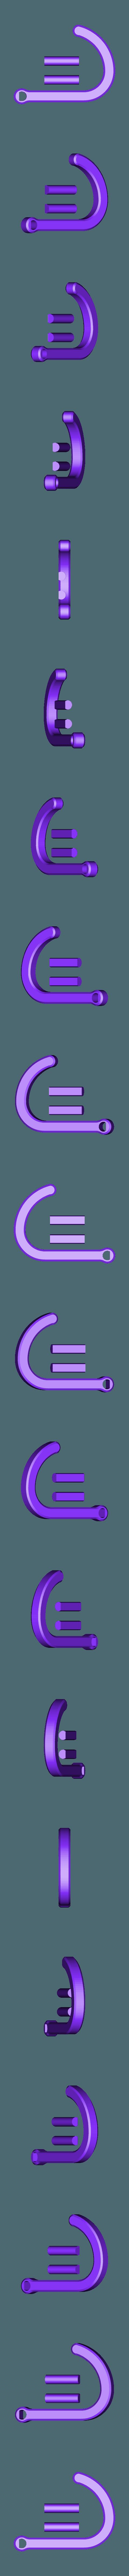 banana_hook.stl Download free STL file Swinging Hook • 3D printer template, AlkinsDesigns